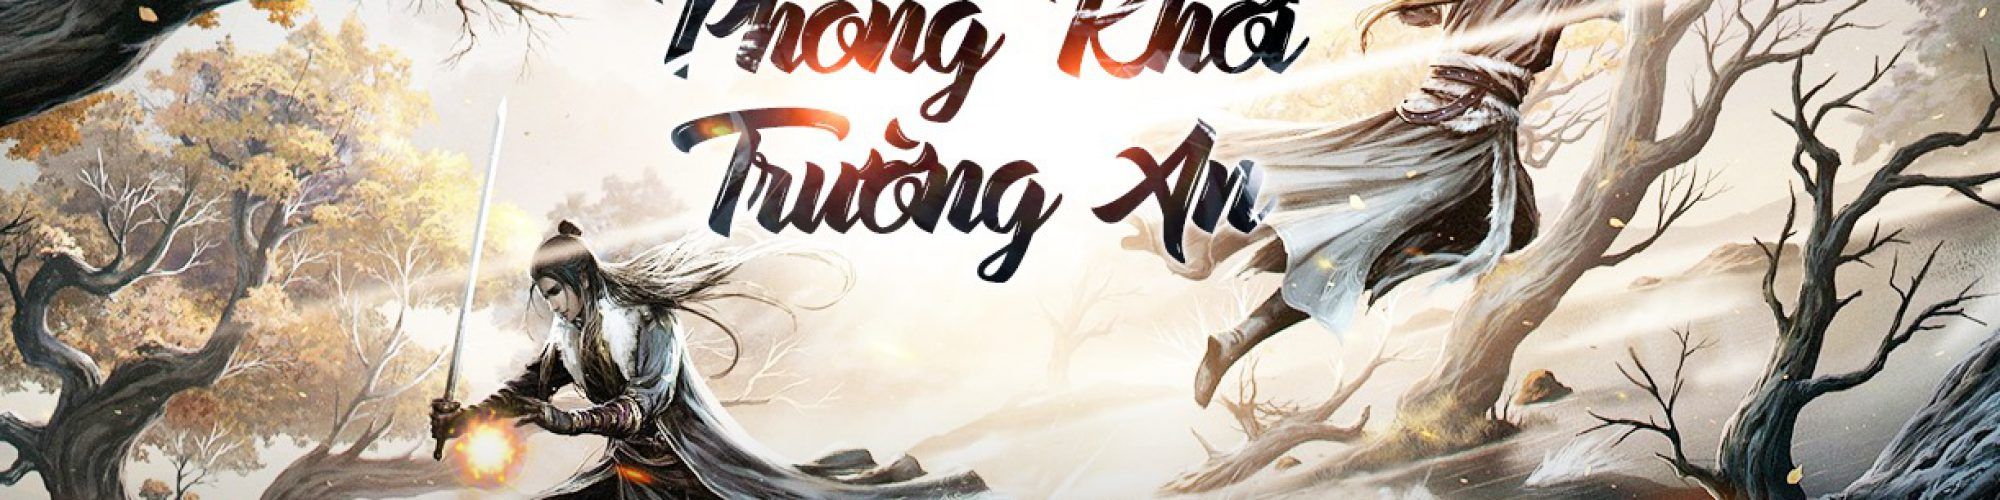 game4v-phong-khoi-truong-an